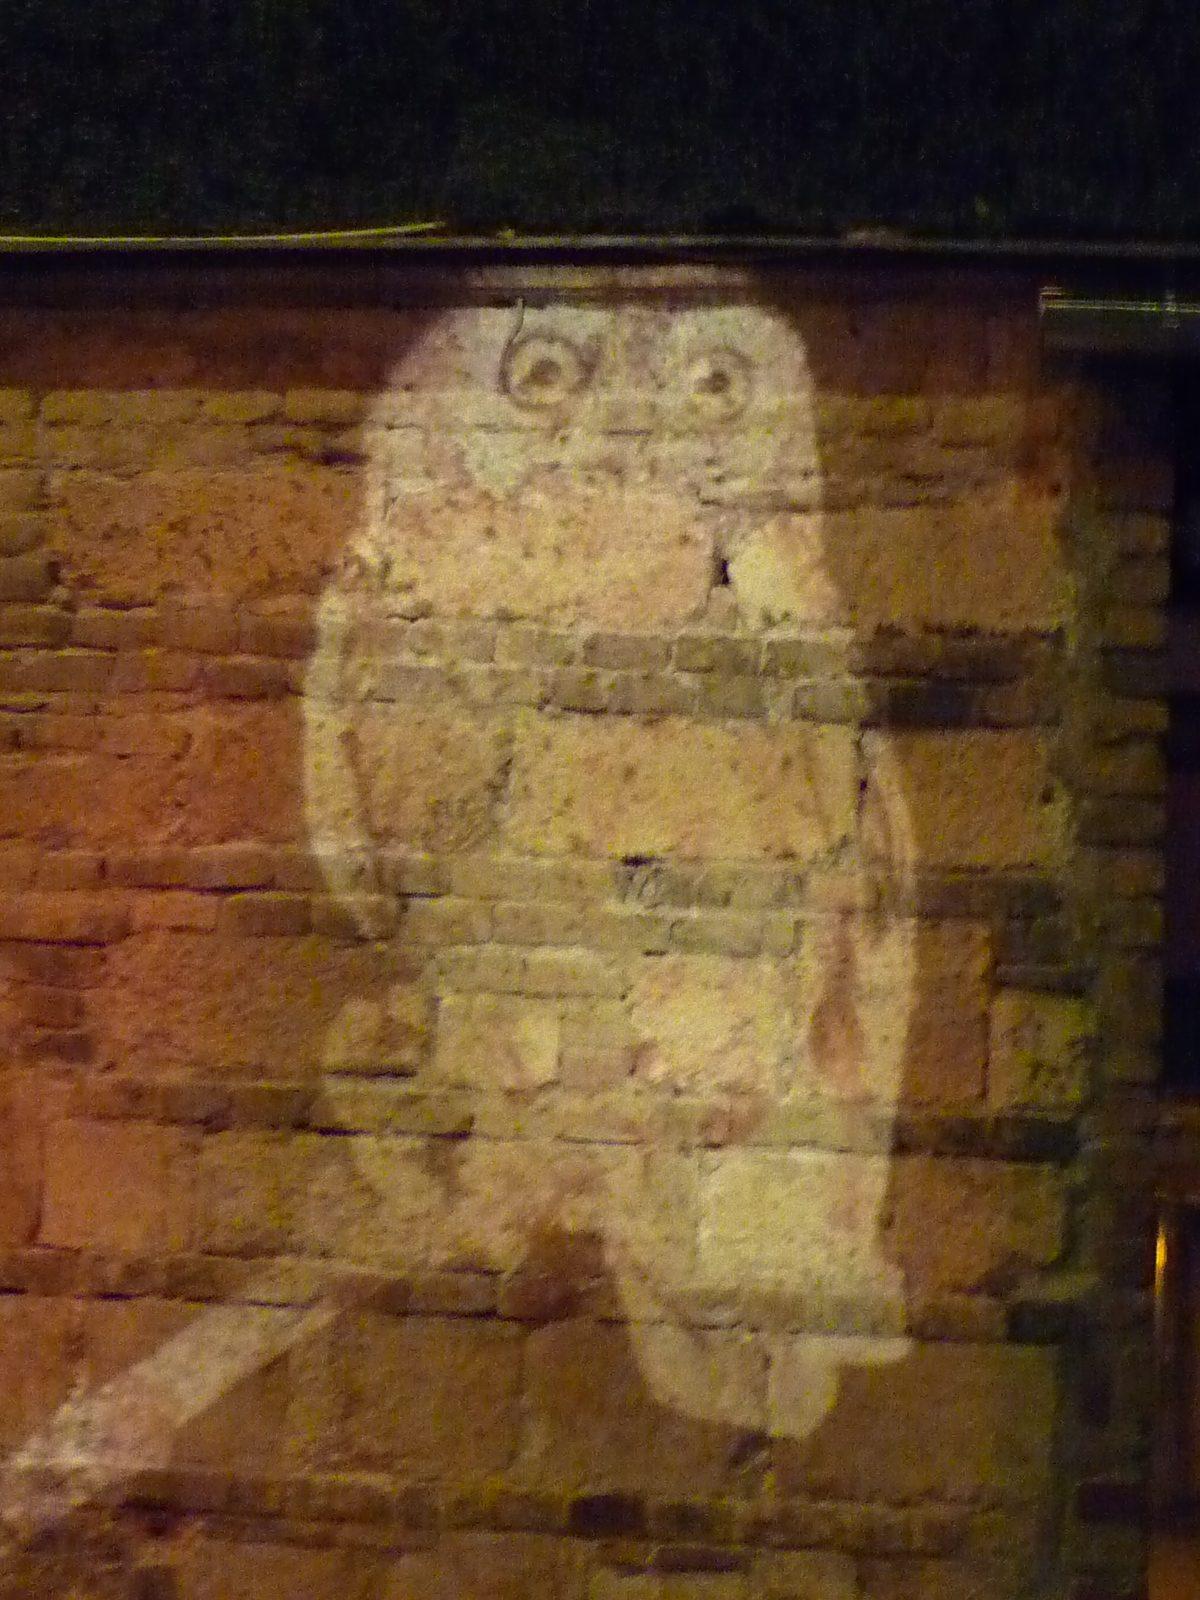 Owl, light projection, Budapest, Hungary